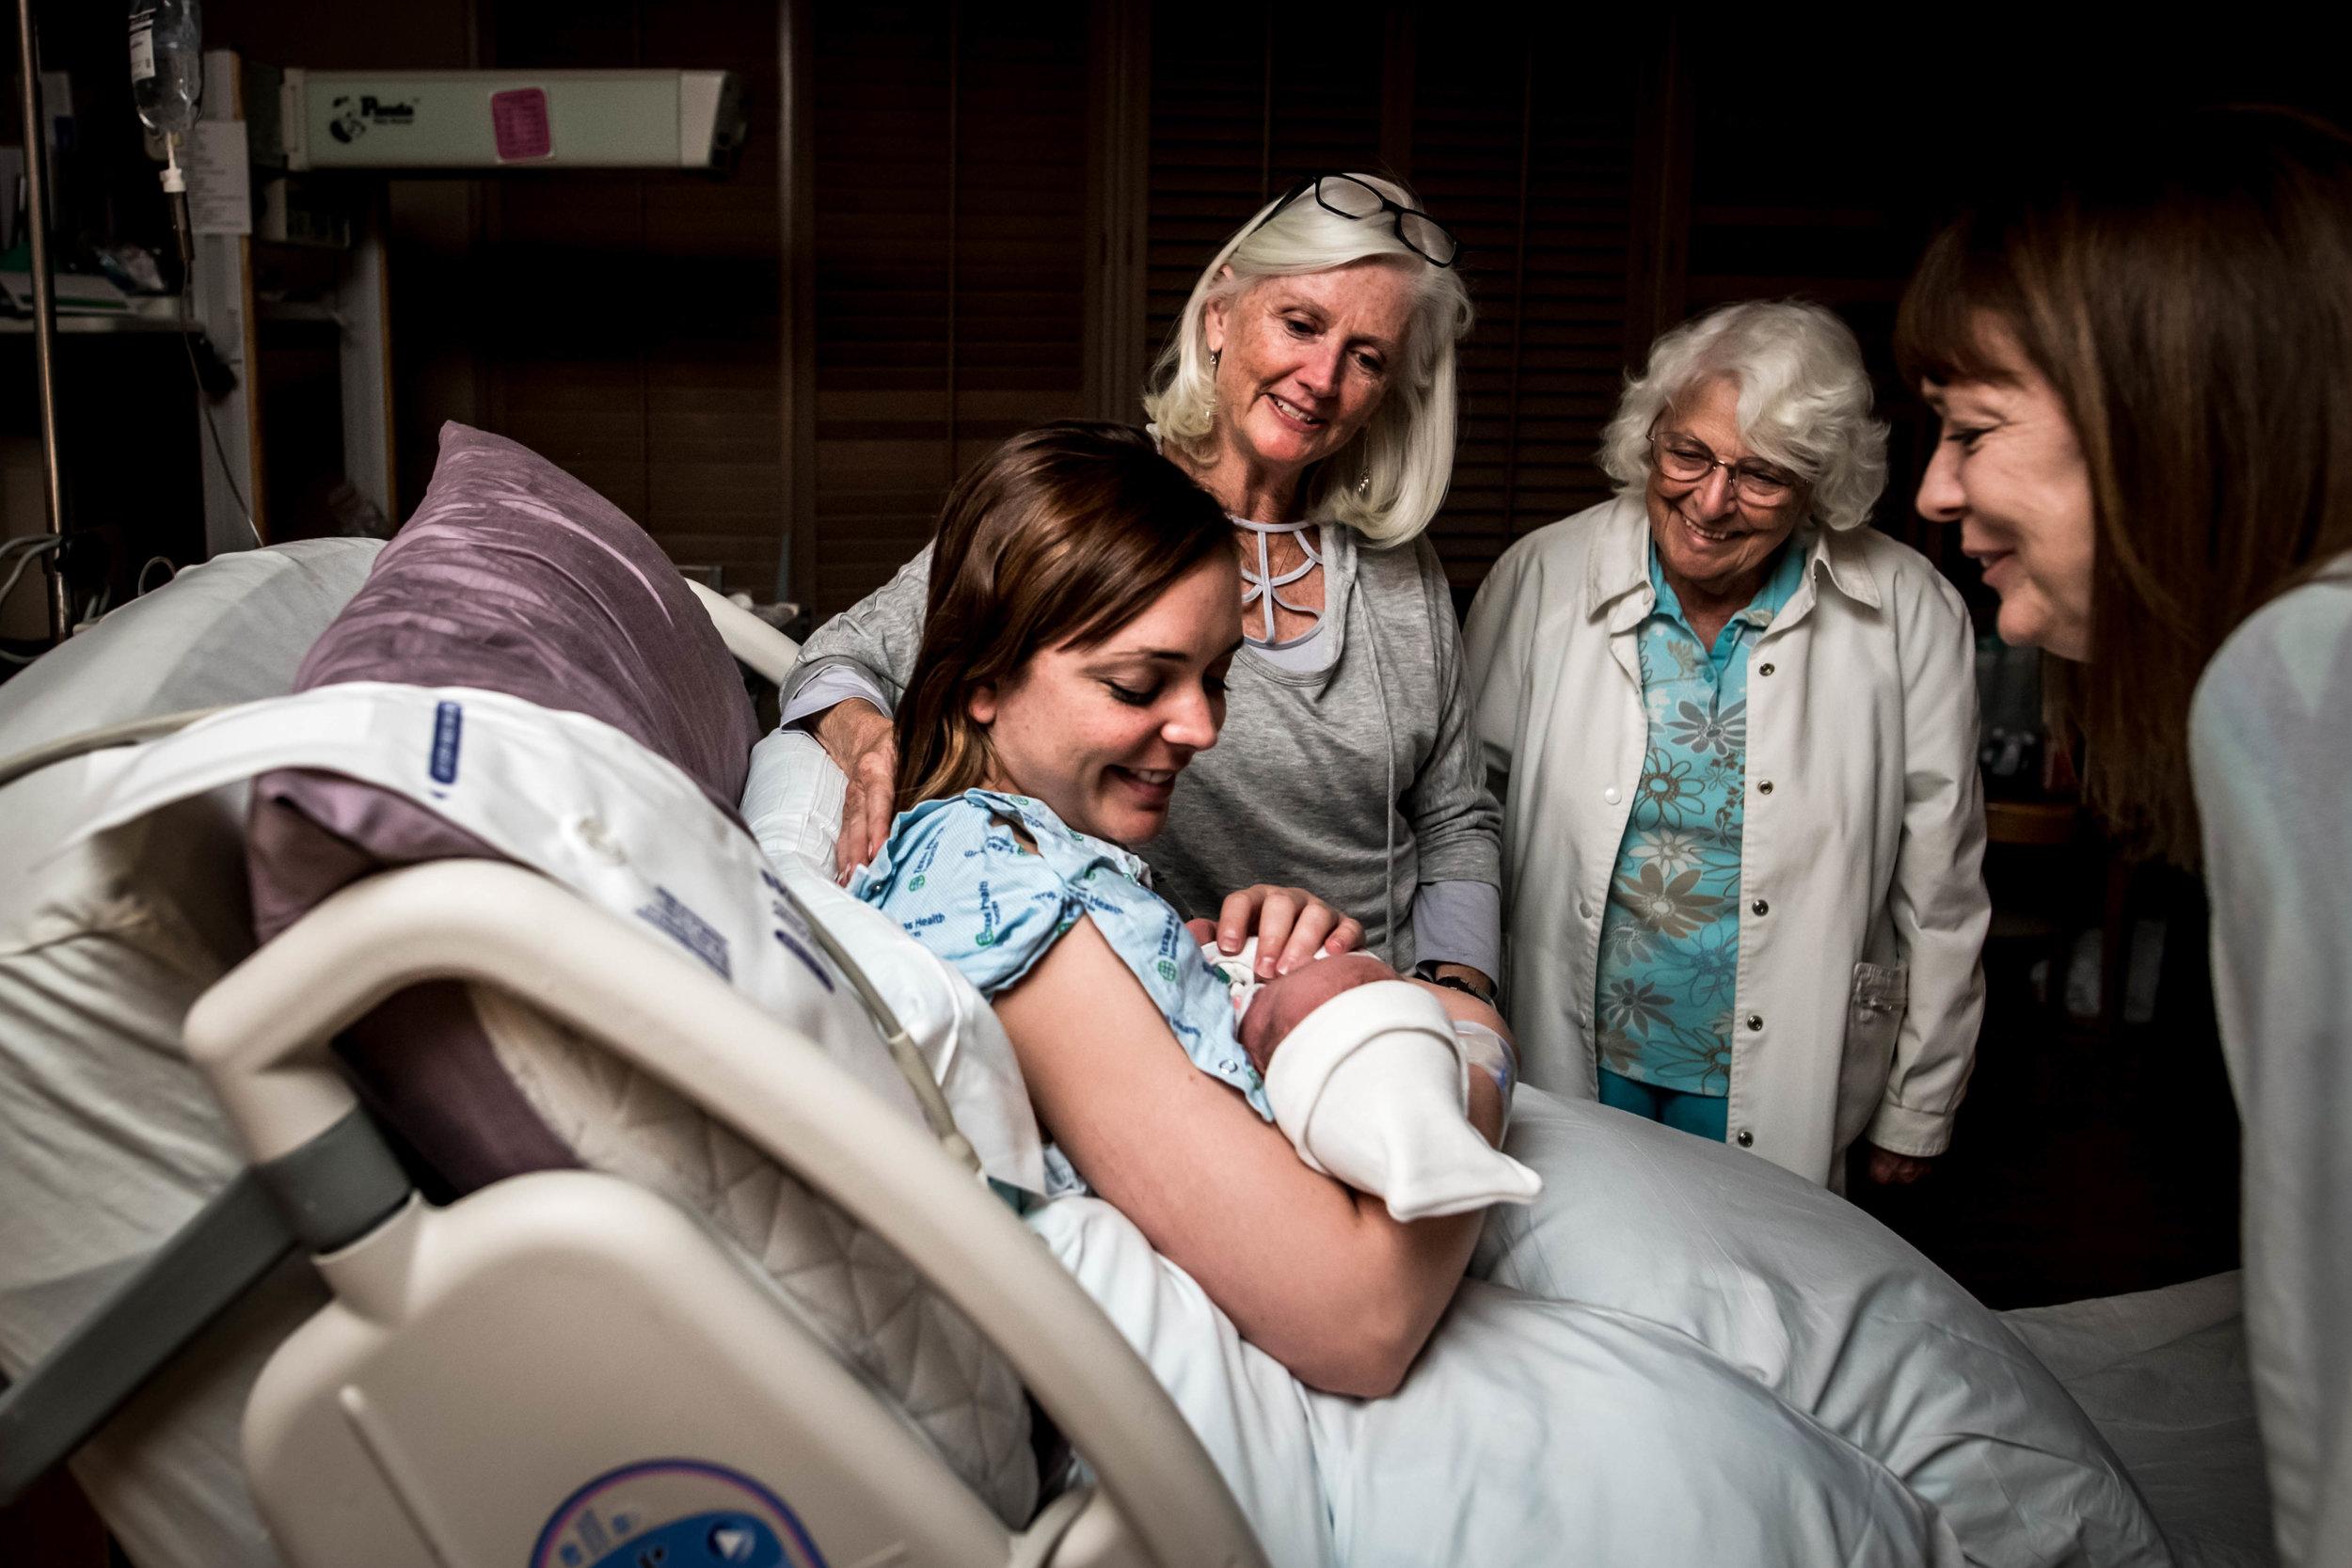 generations gather around to see newborn